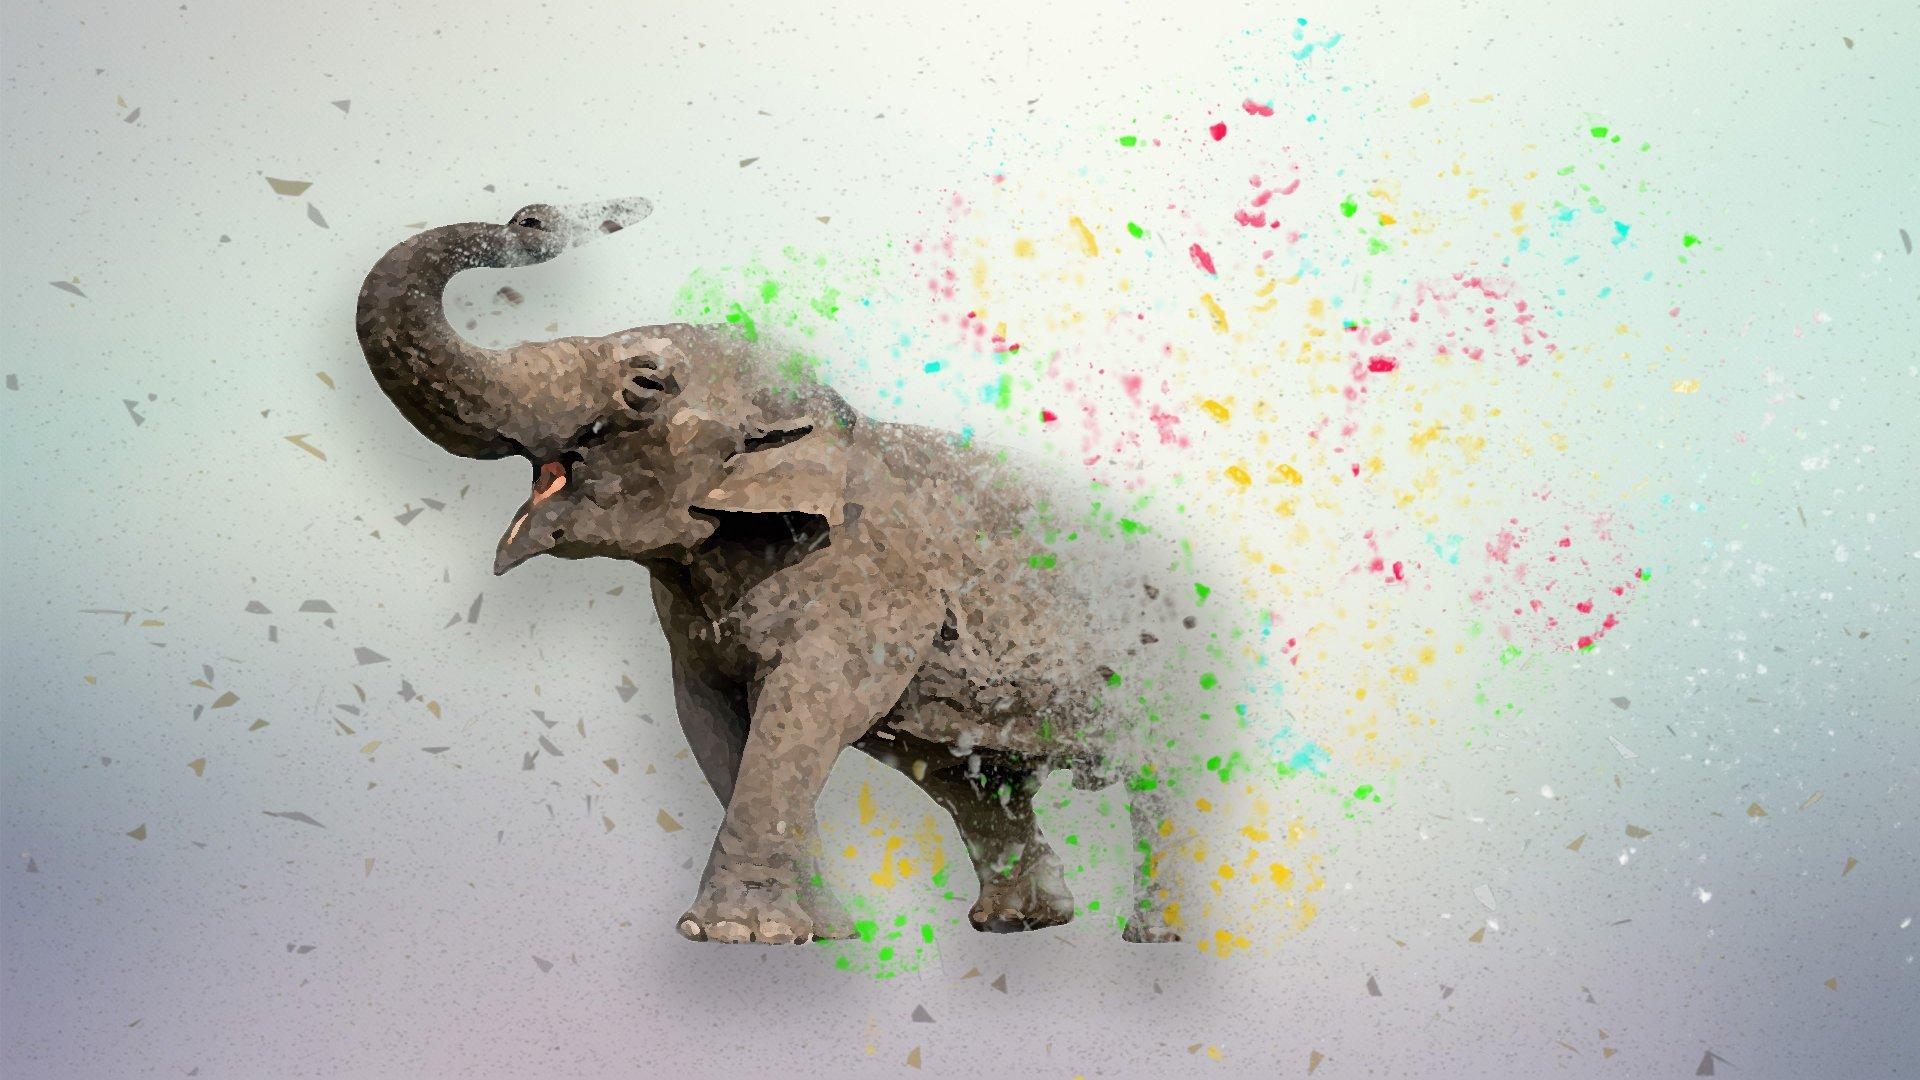 Elephant Wallpaper Hd Wallpaper Background Image